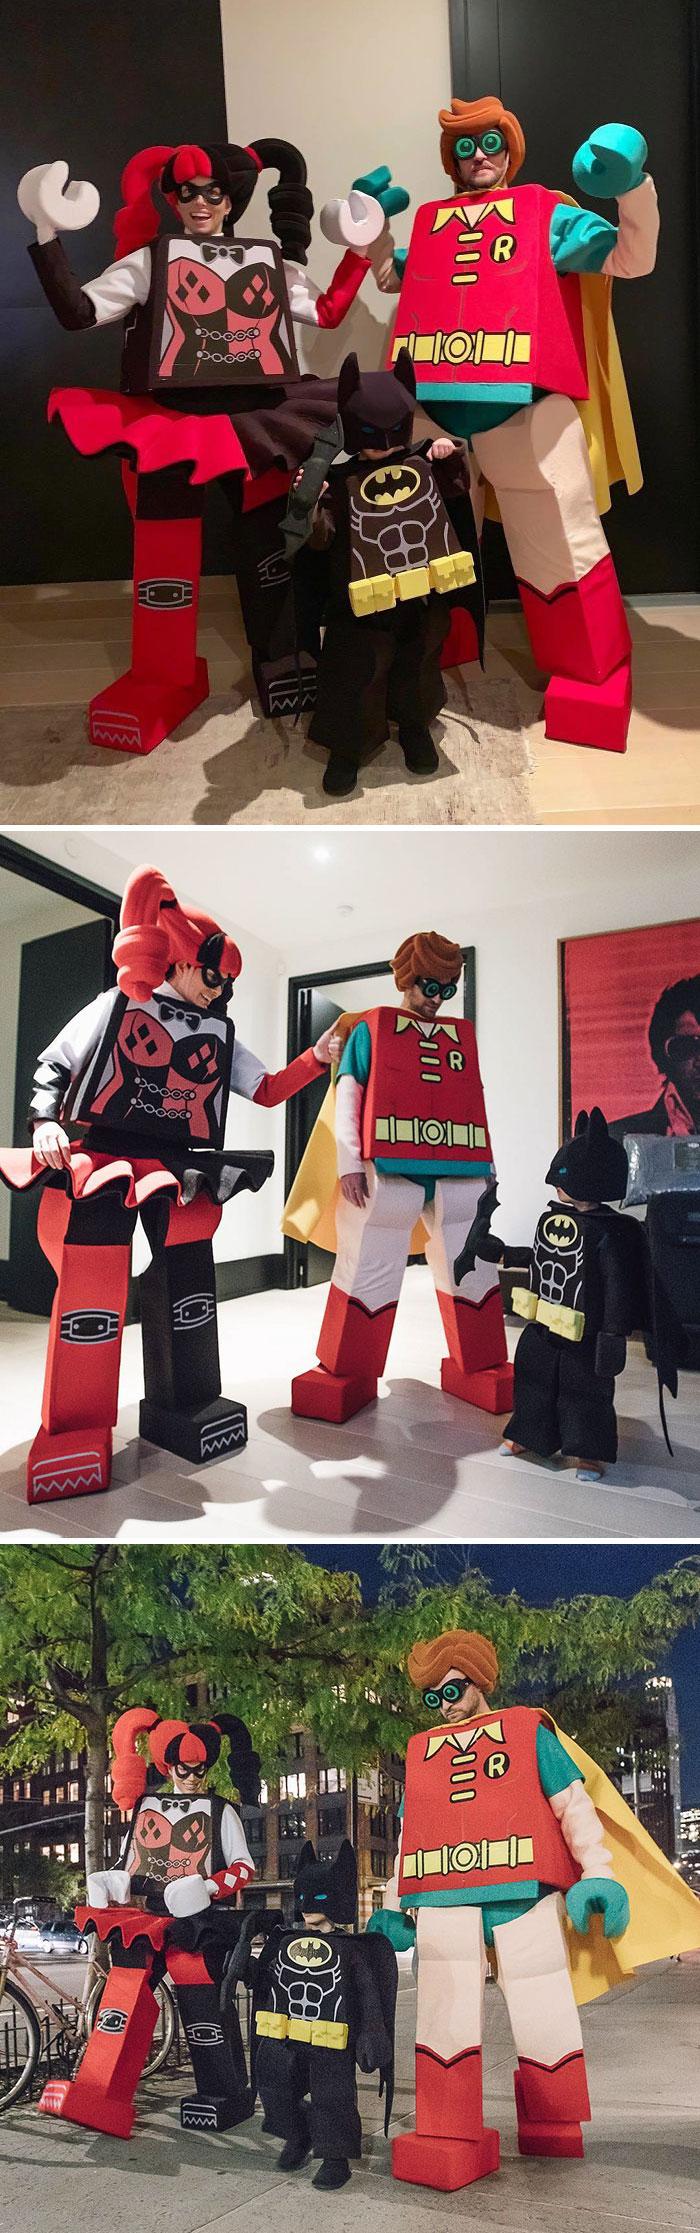 Lego famille deguisement drole groupe, la meilleure idée costume halloween